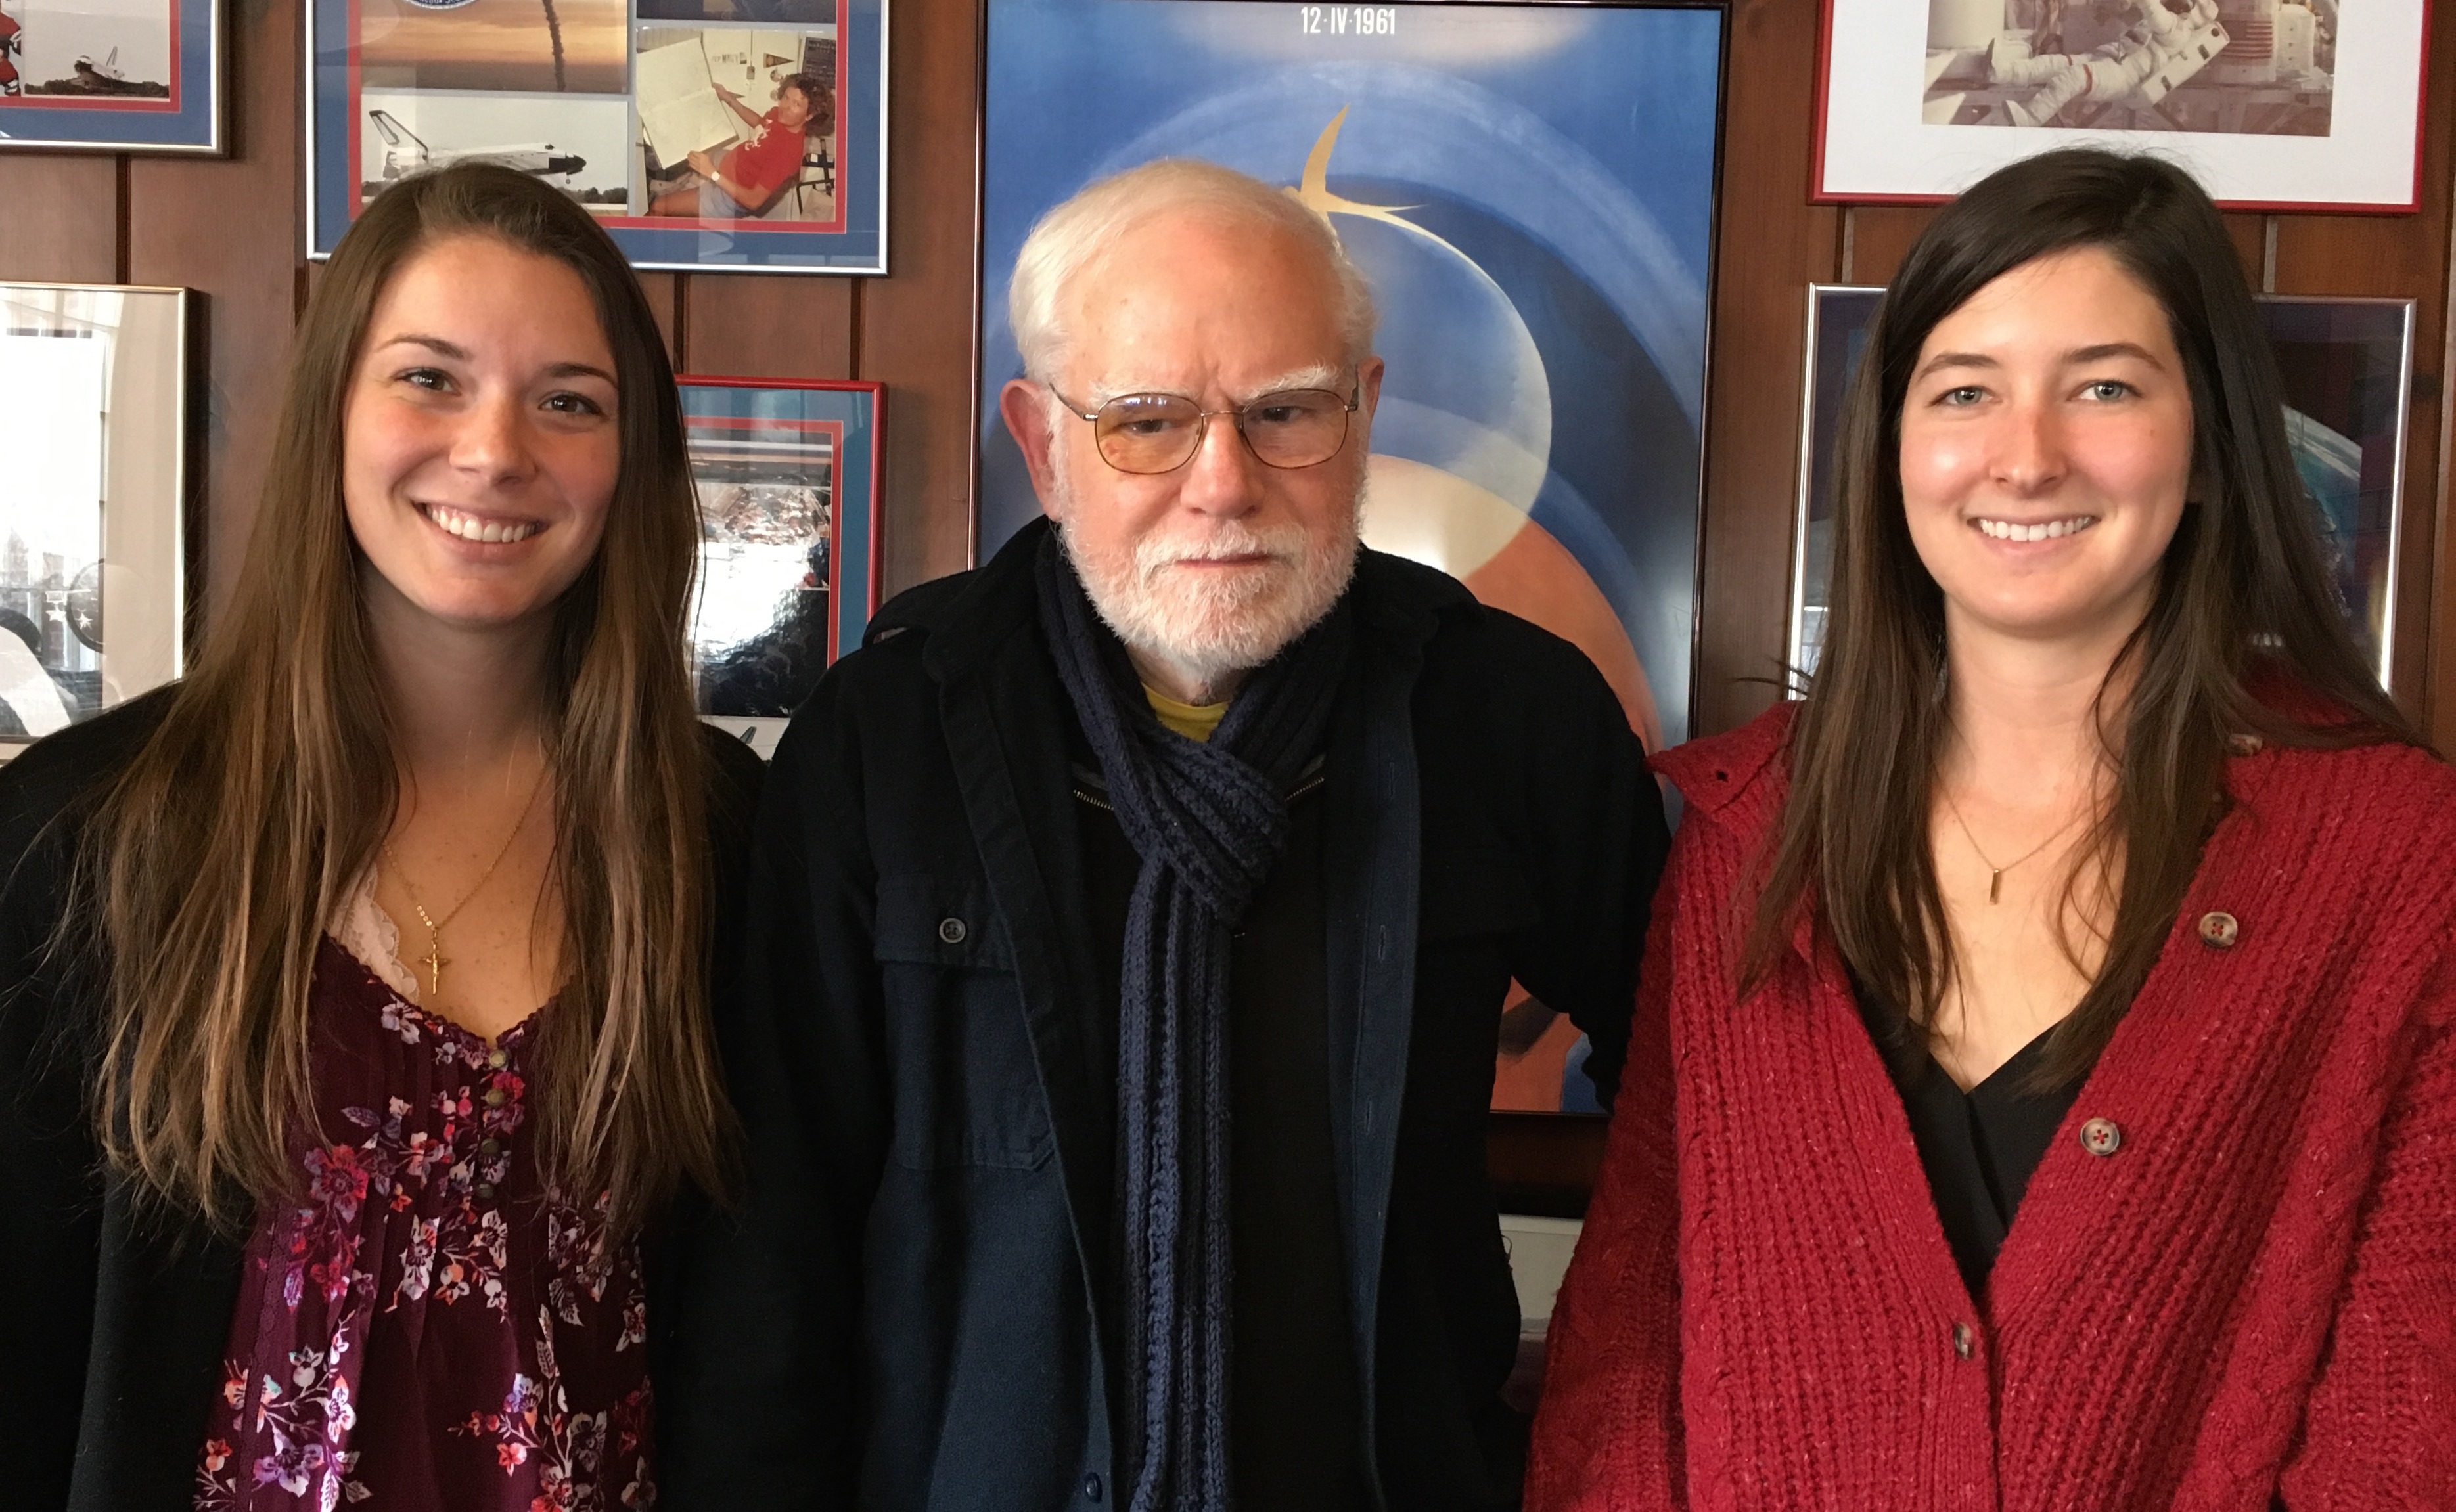 From left, Ashley Palumbo, Jim Head, and Ariel Deutsch.